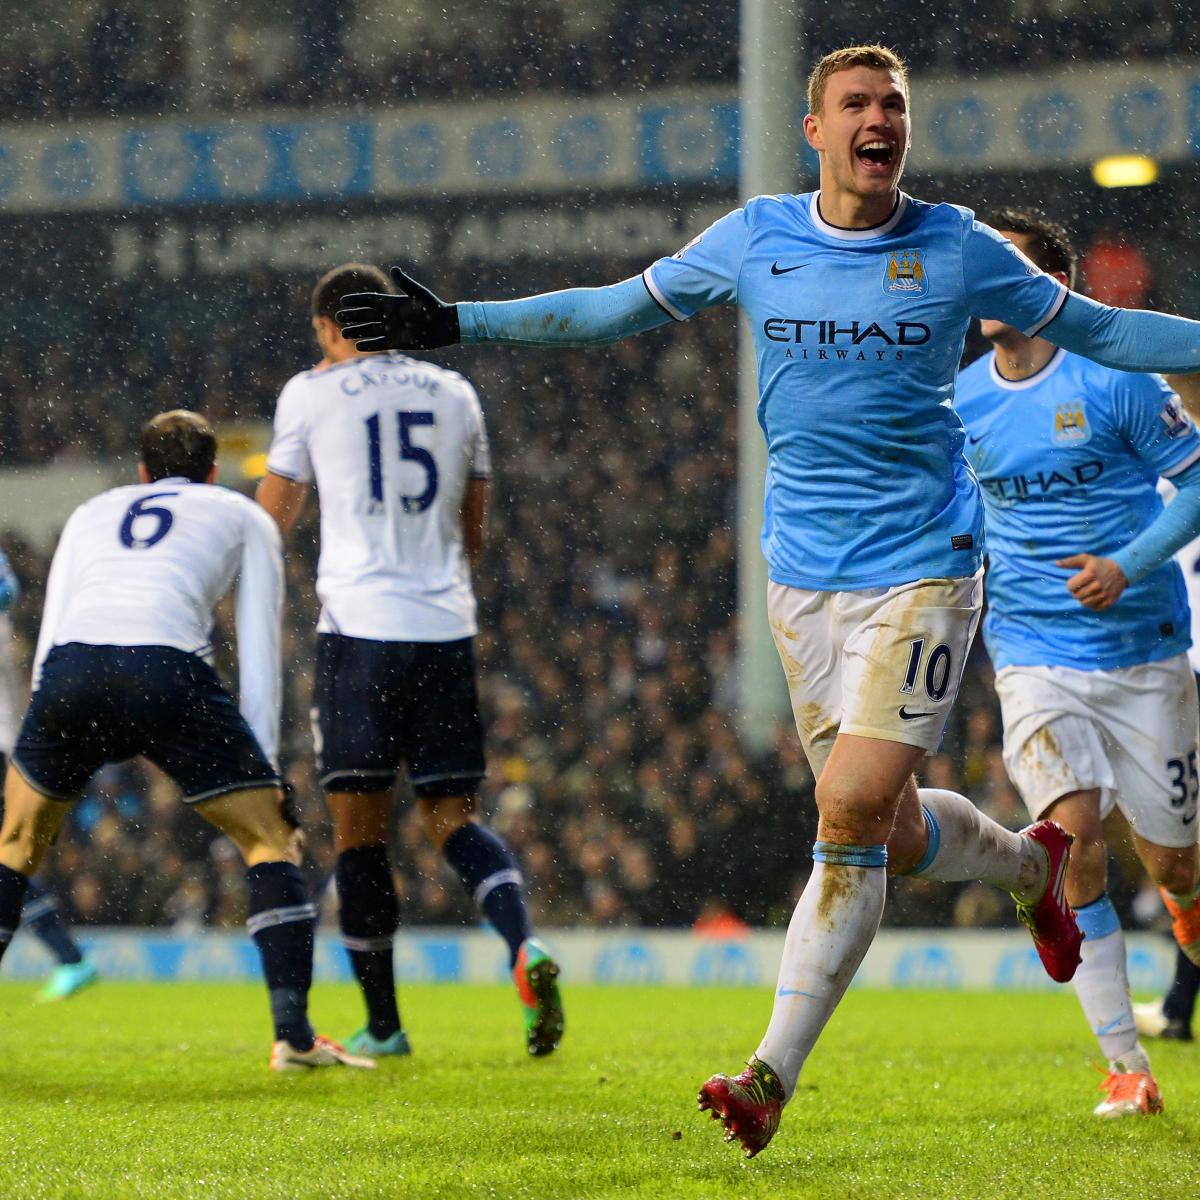 Tottenham Hotspur Vs Man United Tickets: Tottenham Hotspur Vs. Manchester City: Live Score